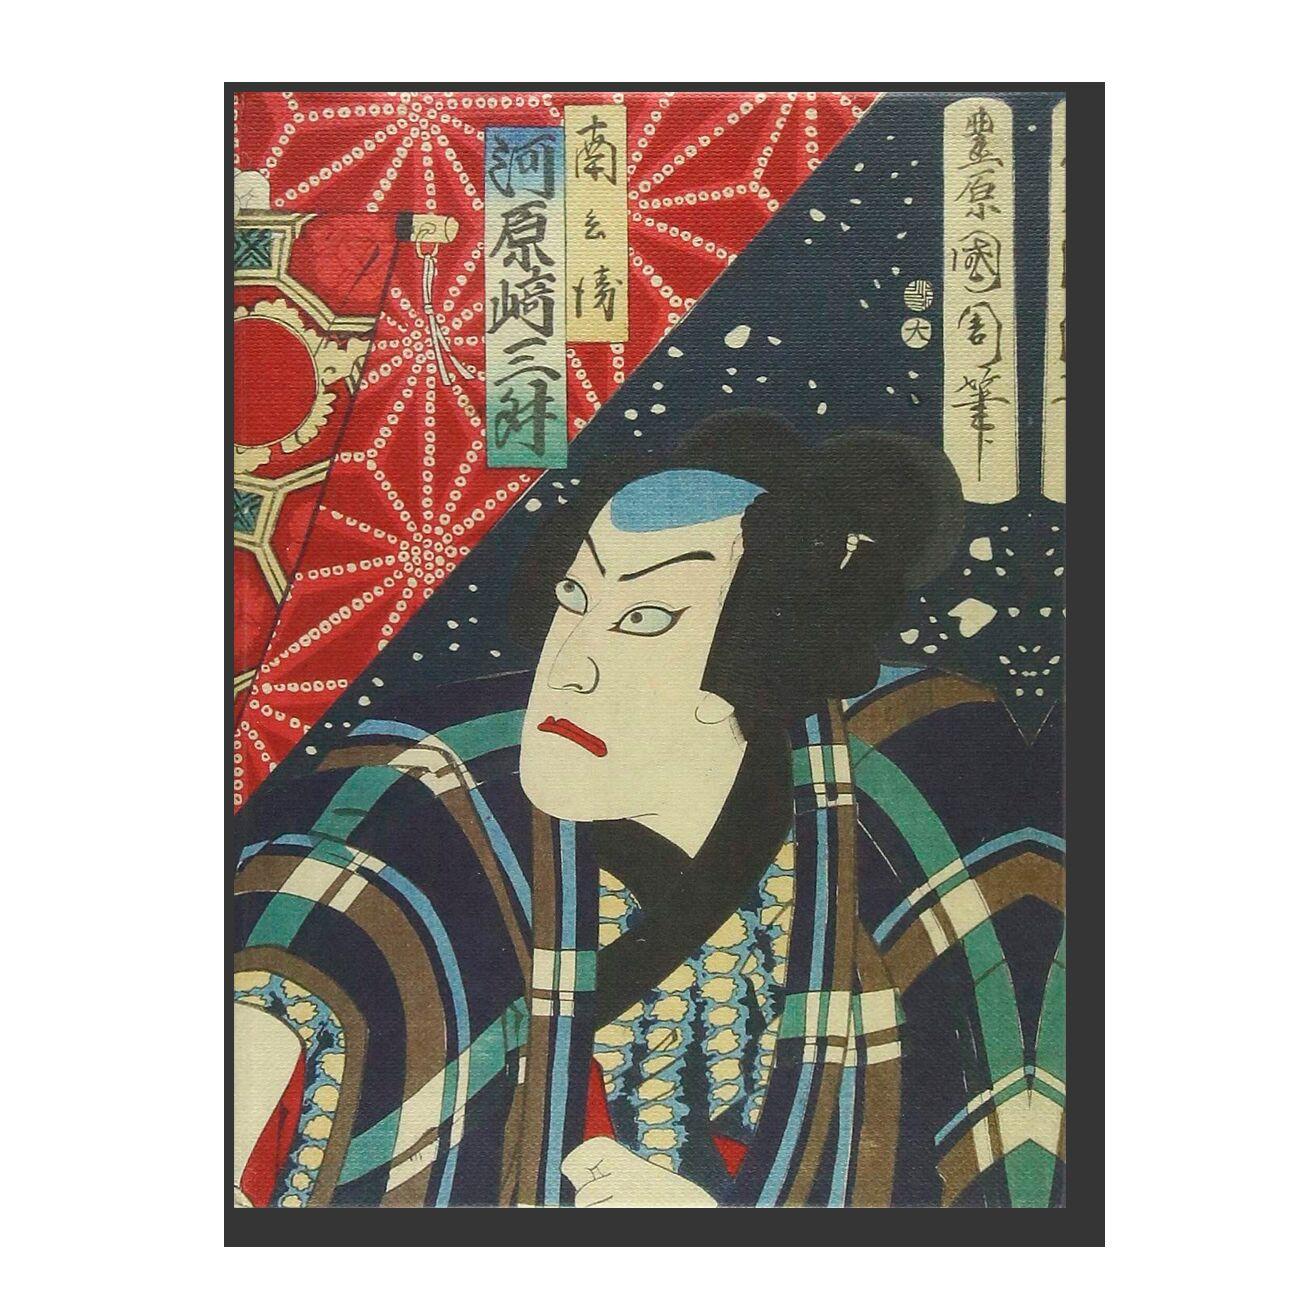 Japanese Woodblock Prints: 100 postcards